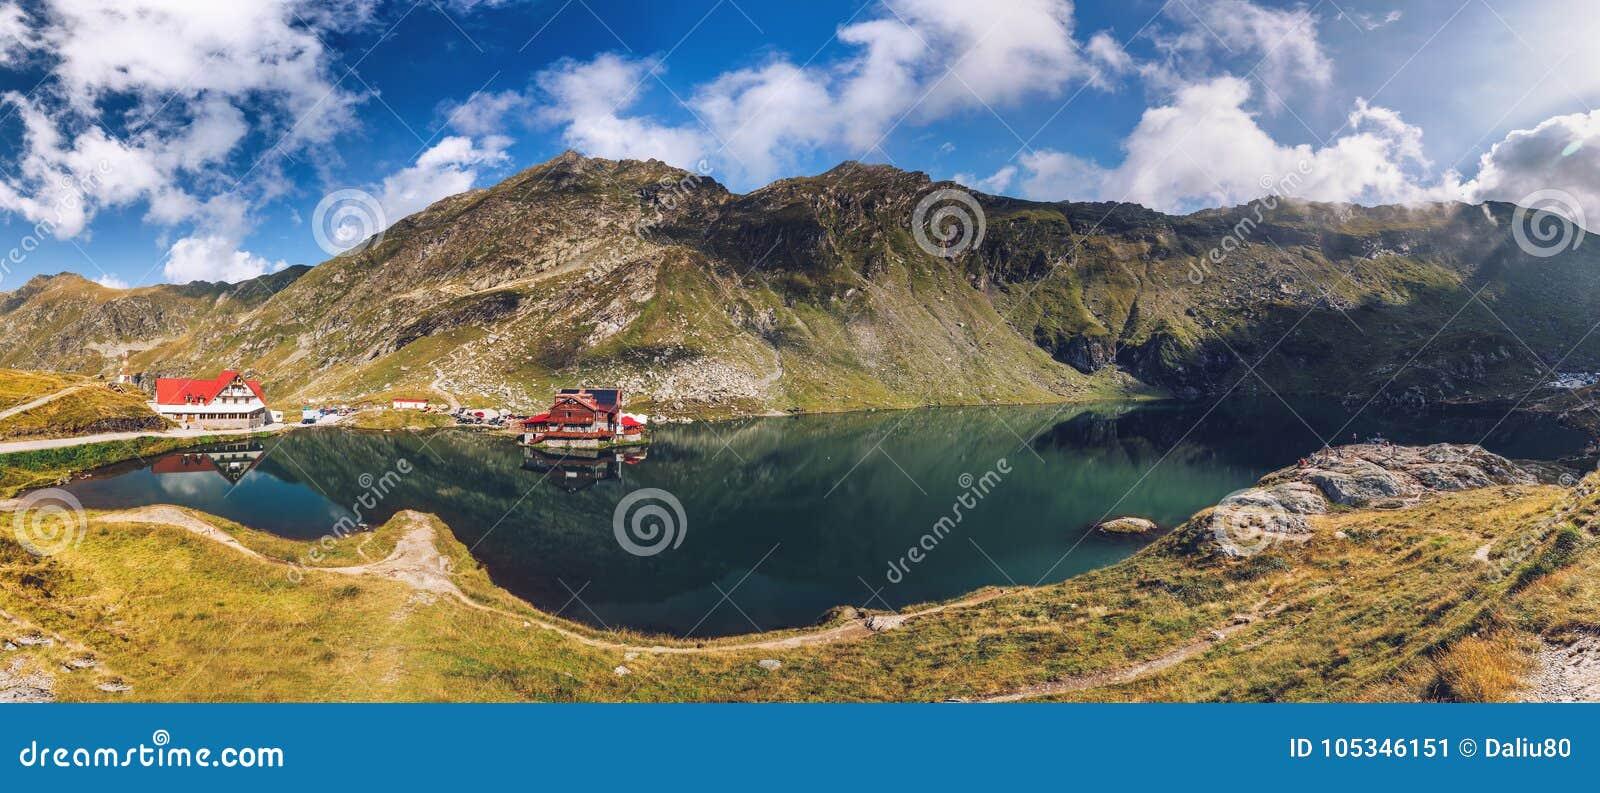 Balea glacier lake near the Transfagarasan road, panoramic view.